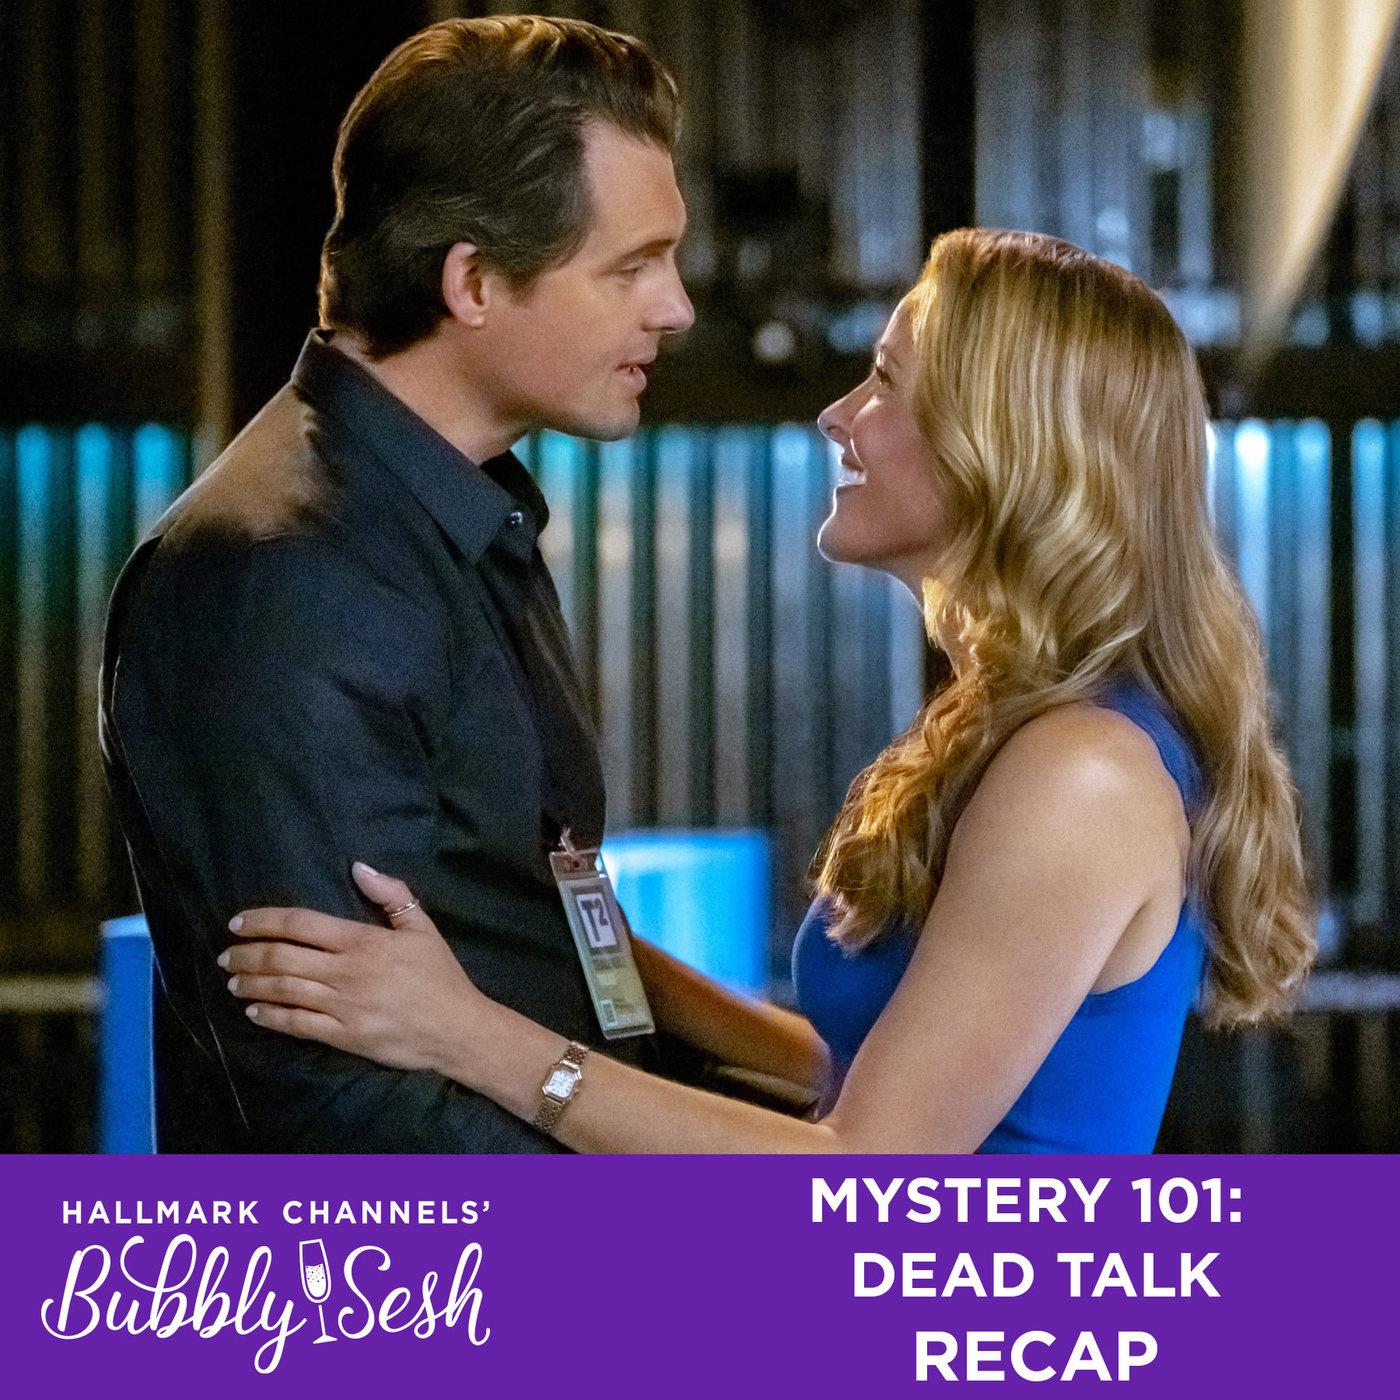 Mystery 101: Dead Talk Recap